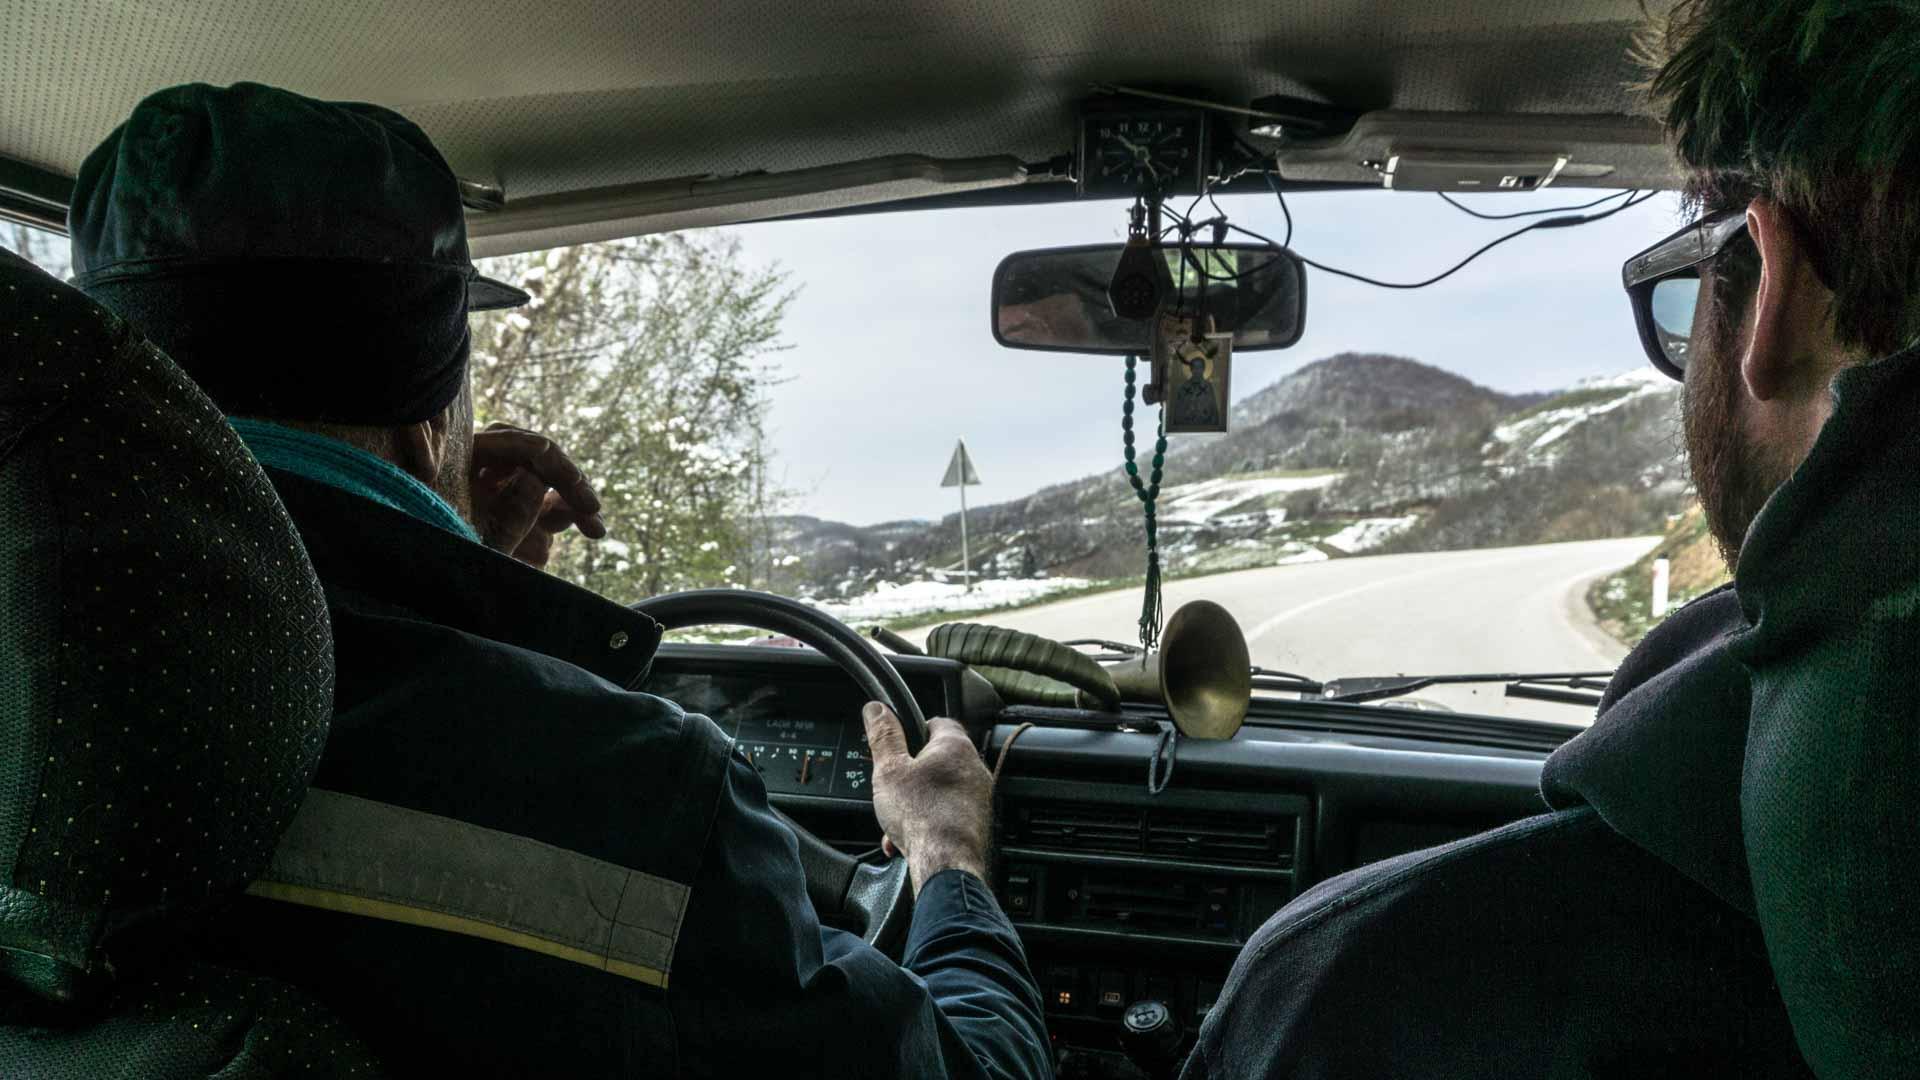 SerialHikers stop autostop world monde tour hitchhiking aventure adventure alternative travel voyage sans avion no fly communiquer communicate serbie uvac